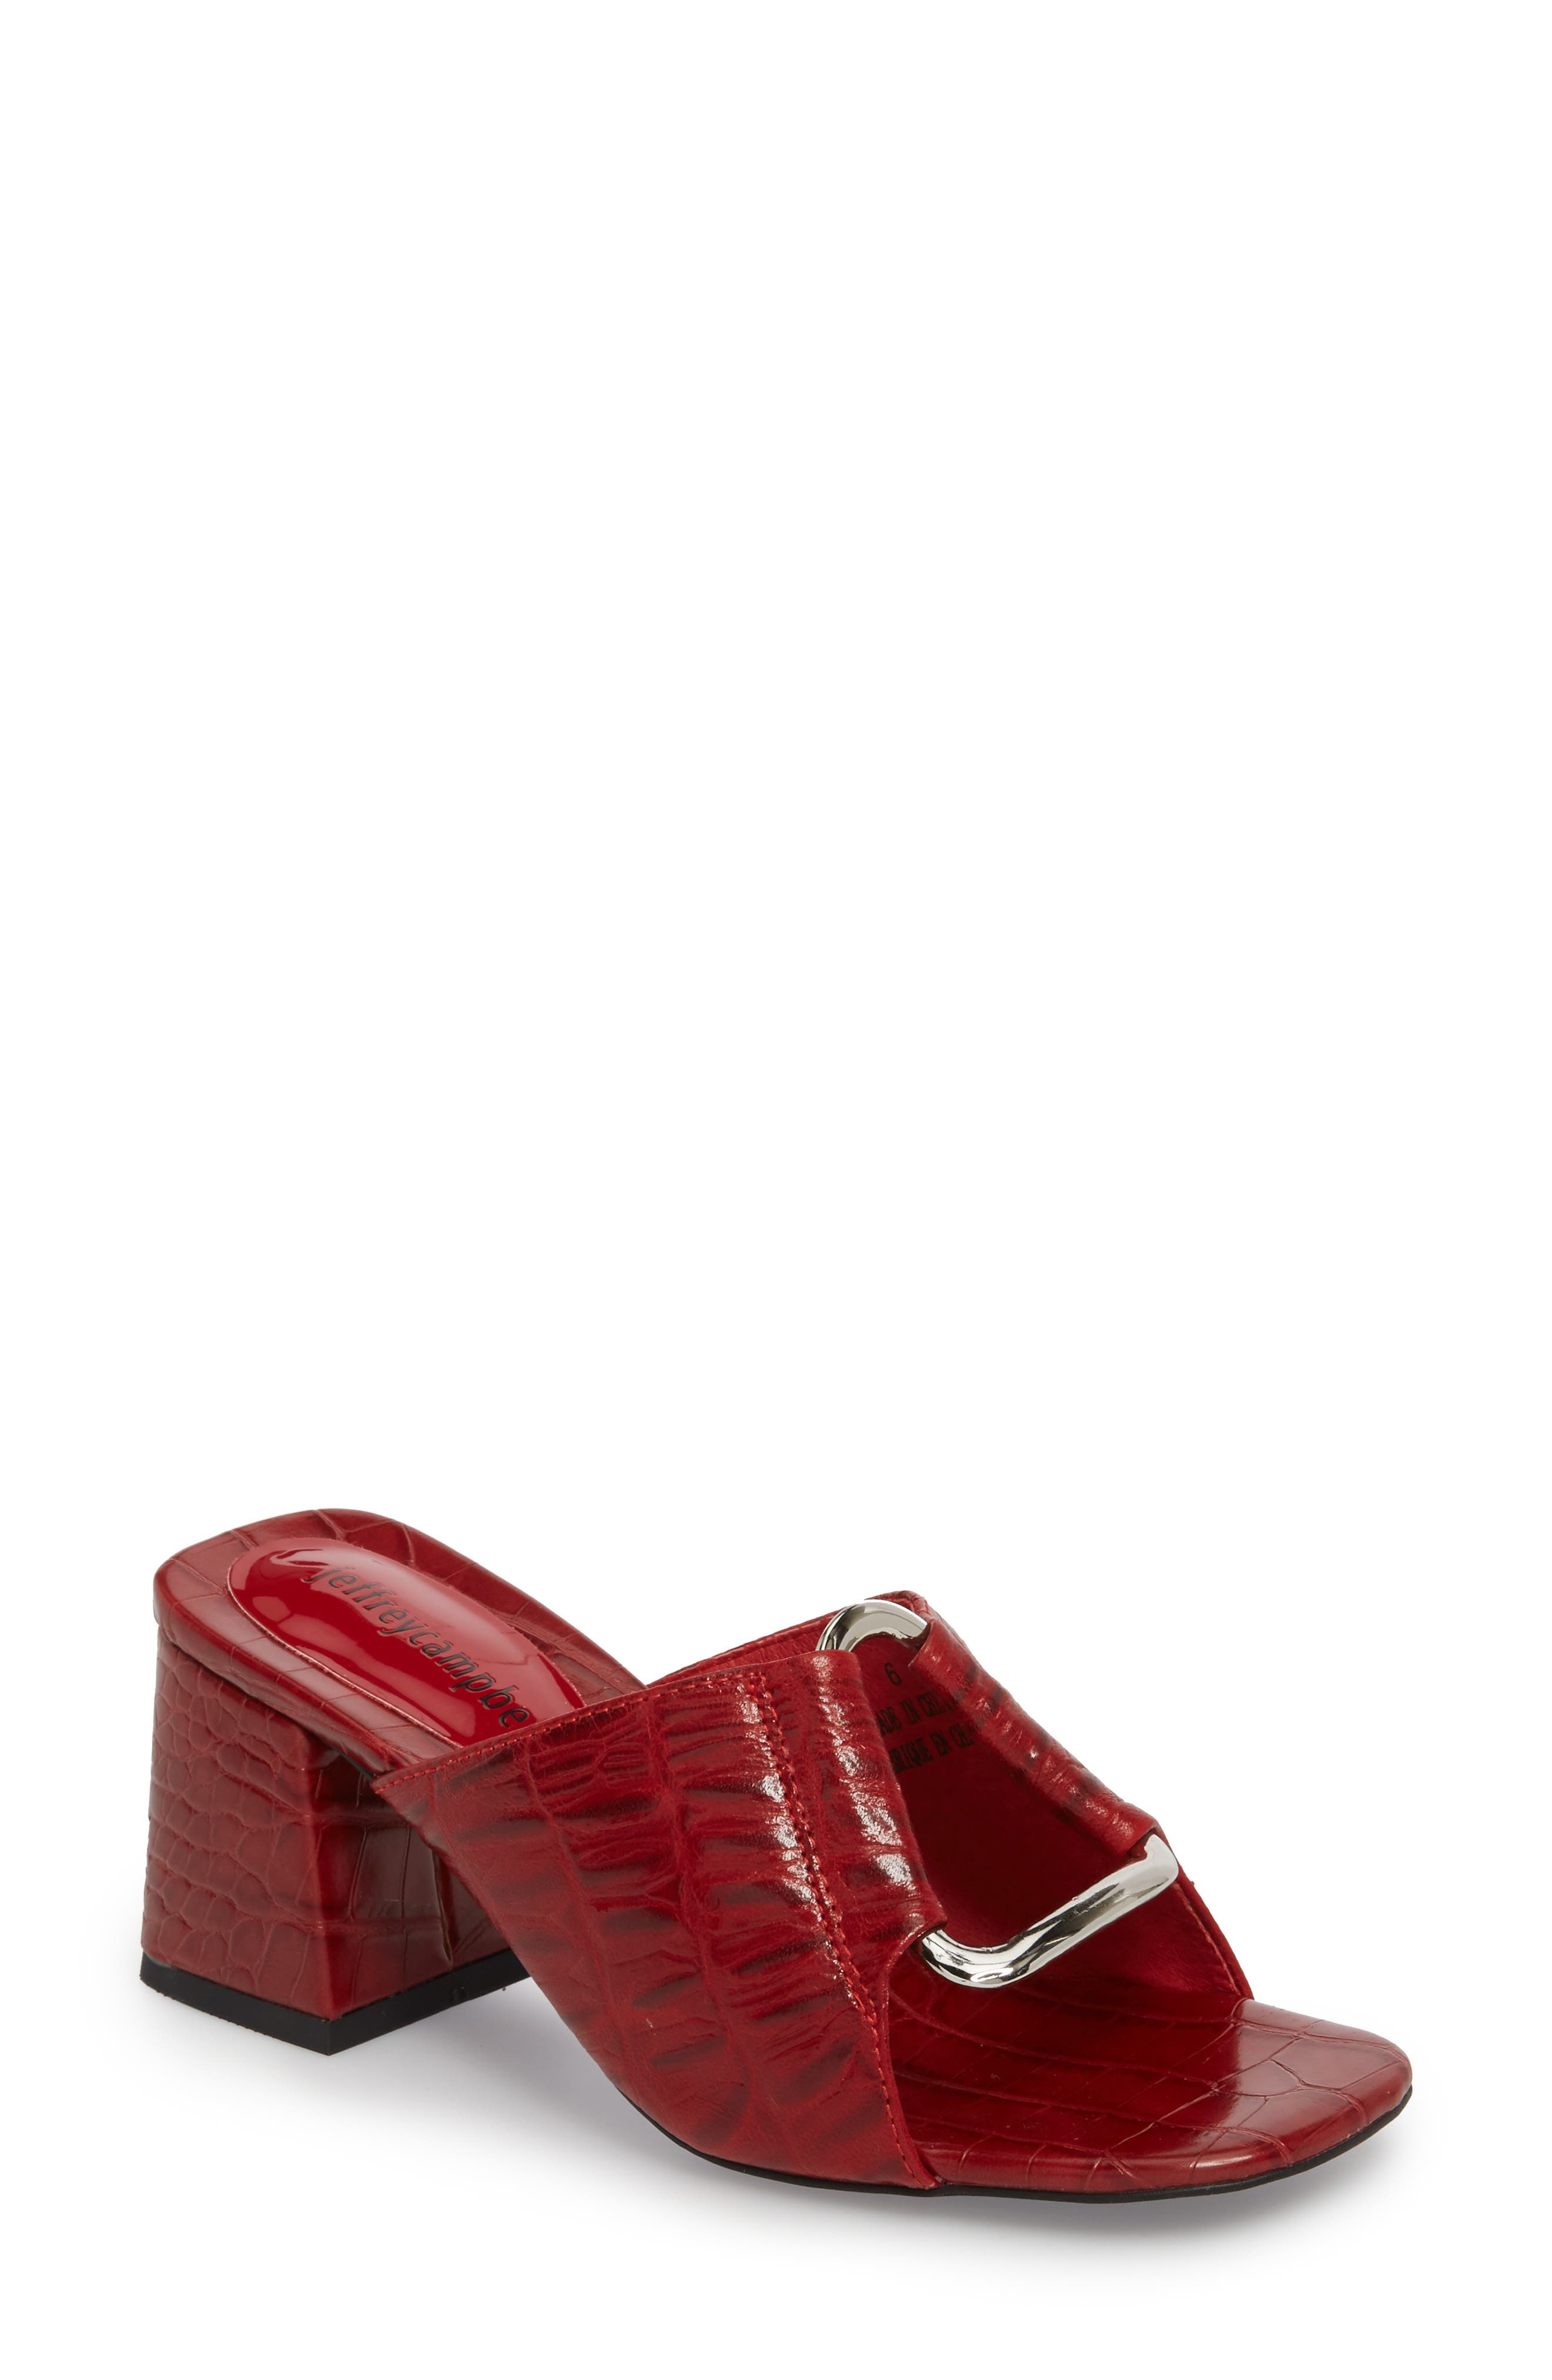 Alternate Image 1 Selected - Jeffrey Campbell Milagro Flared Heel Sandal (Women)